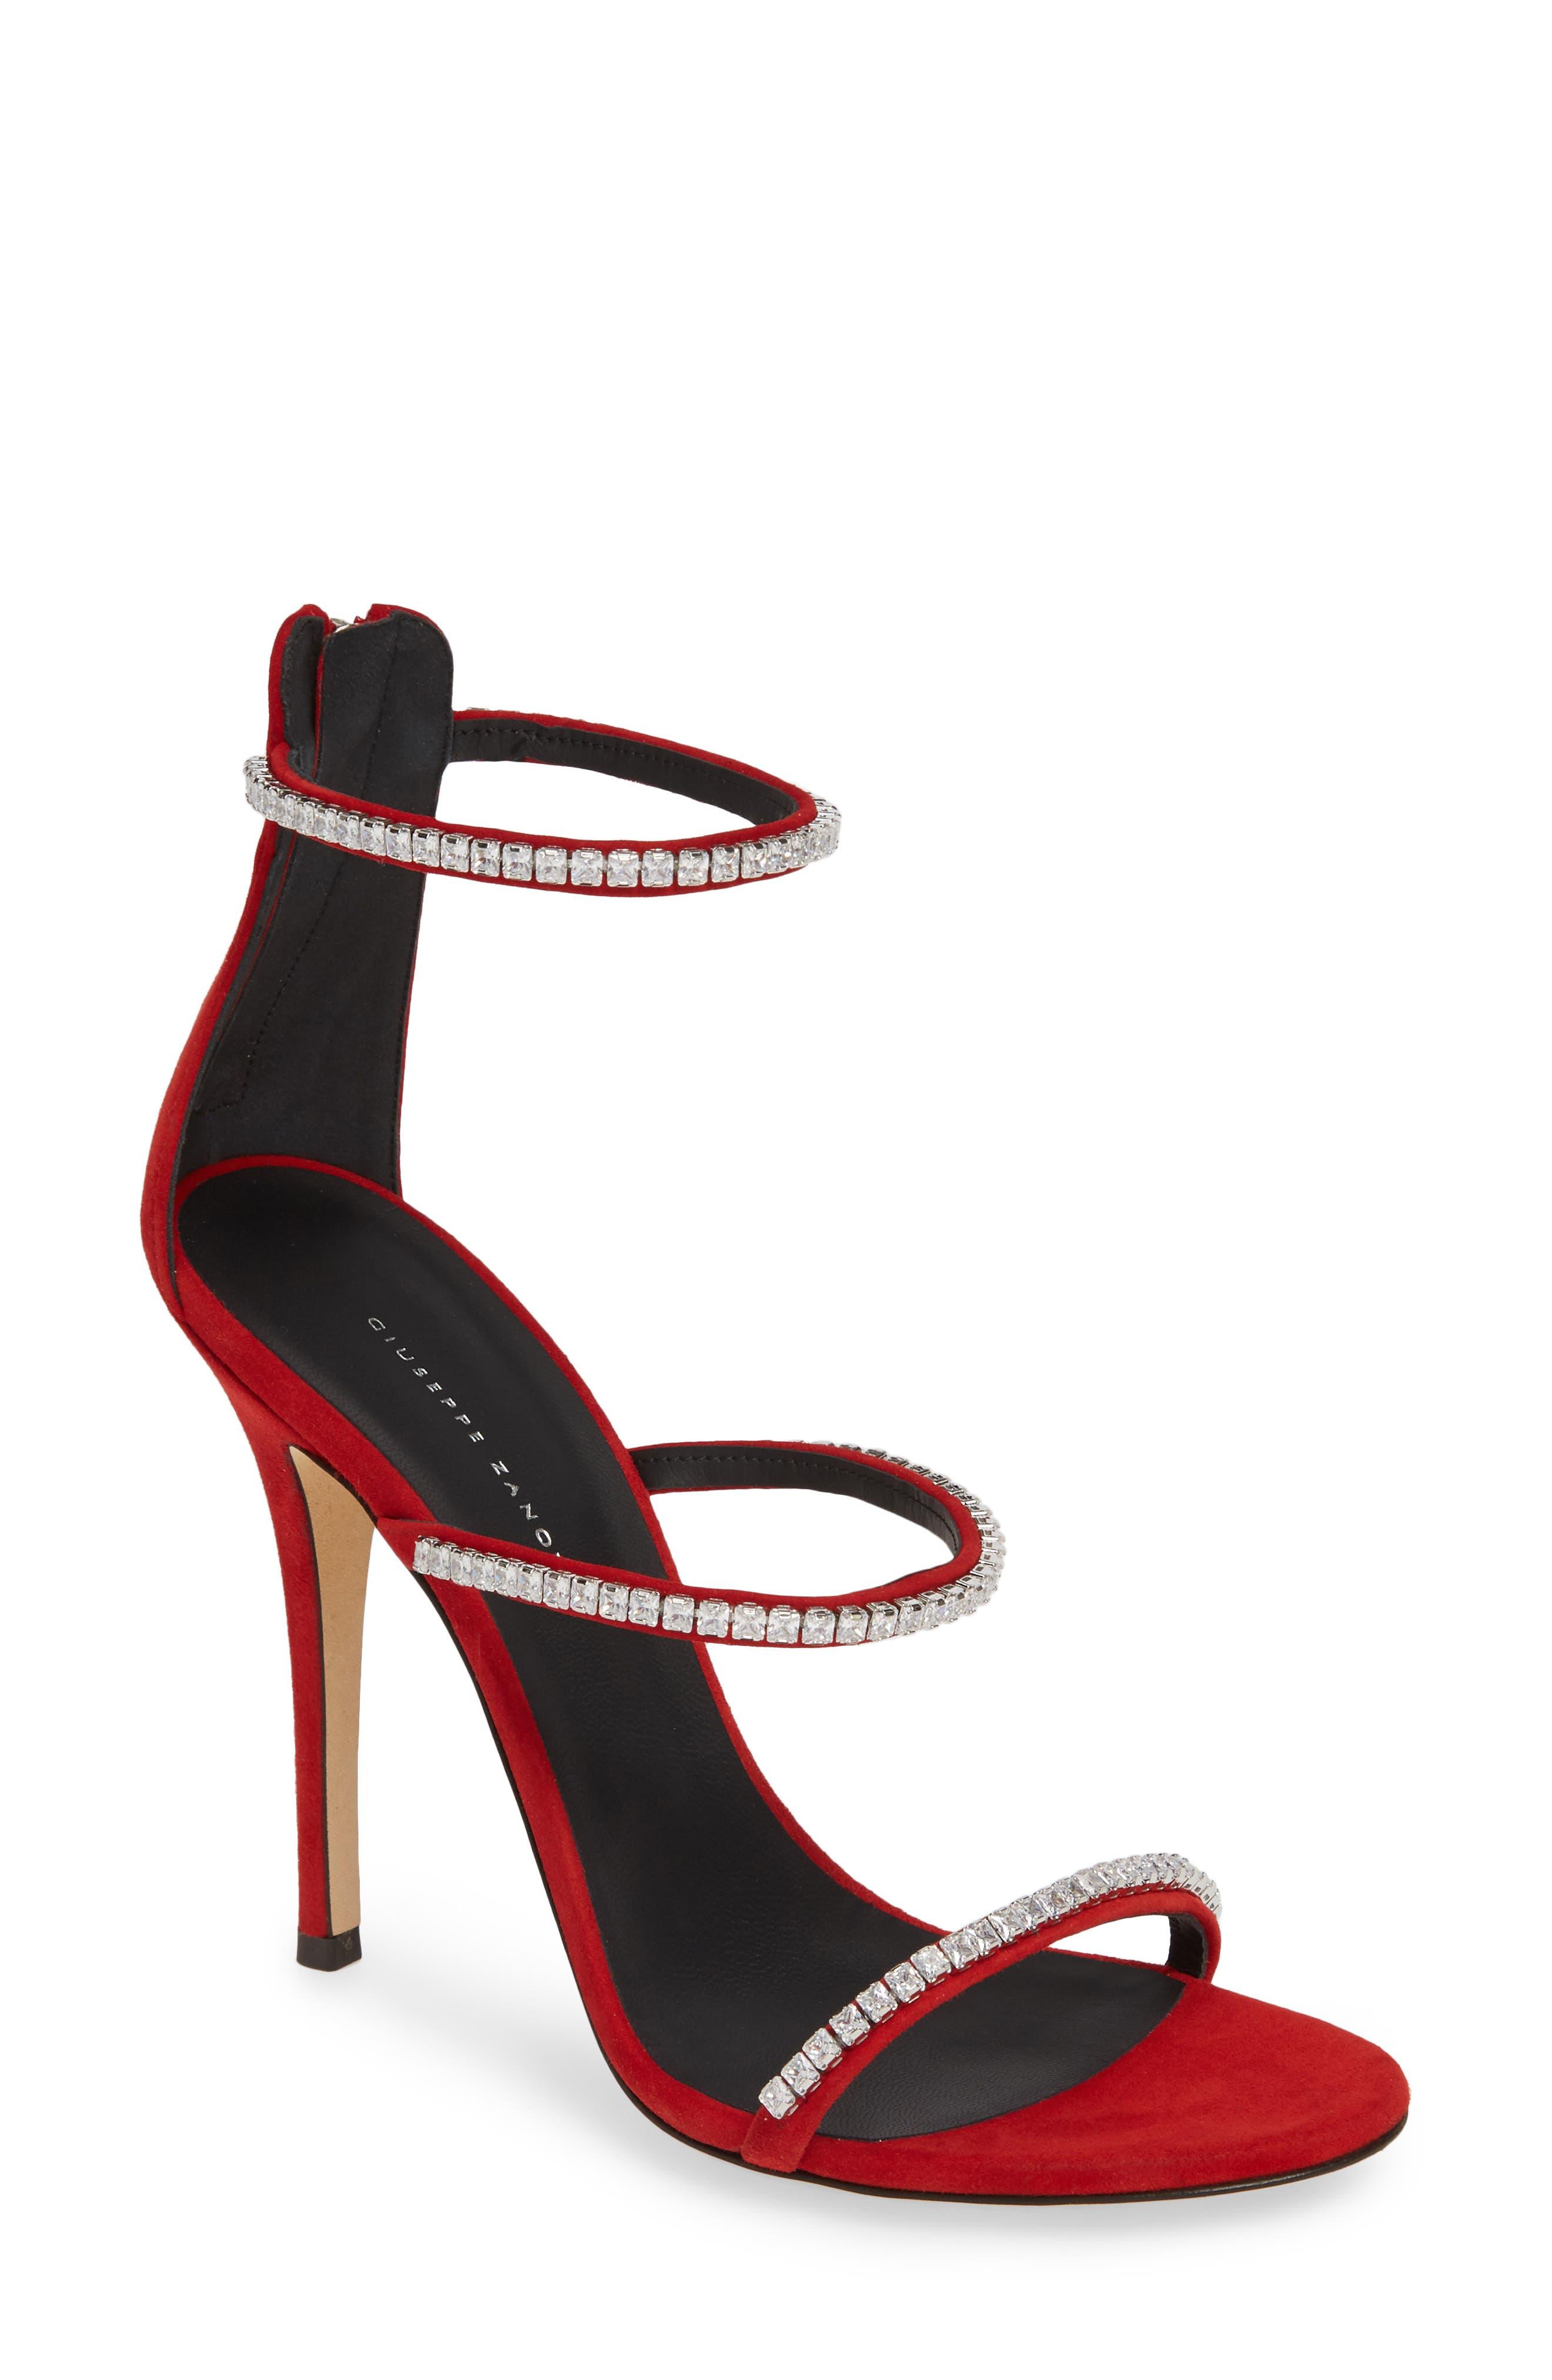 cddf8d43c4828 Women's Giuseppe Zanotti Heels | Nordstrom